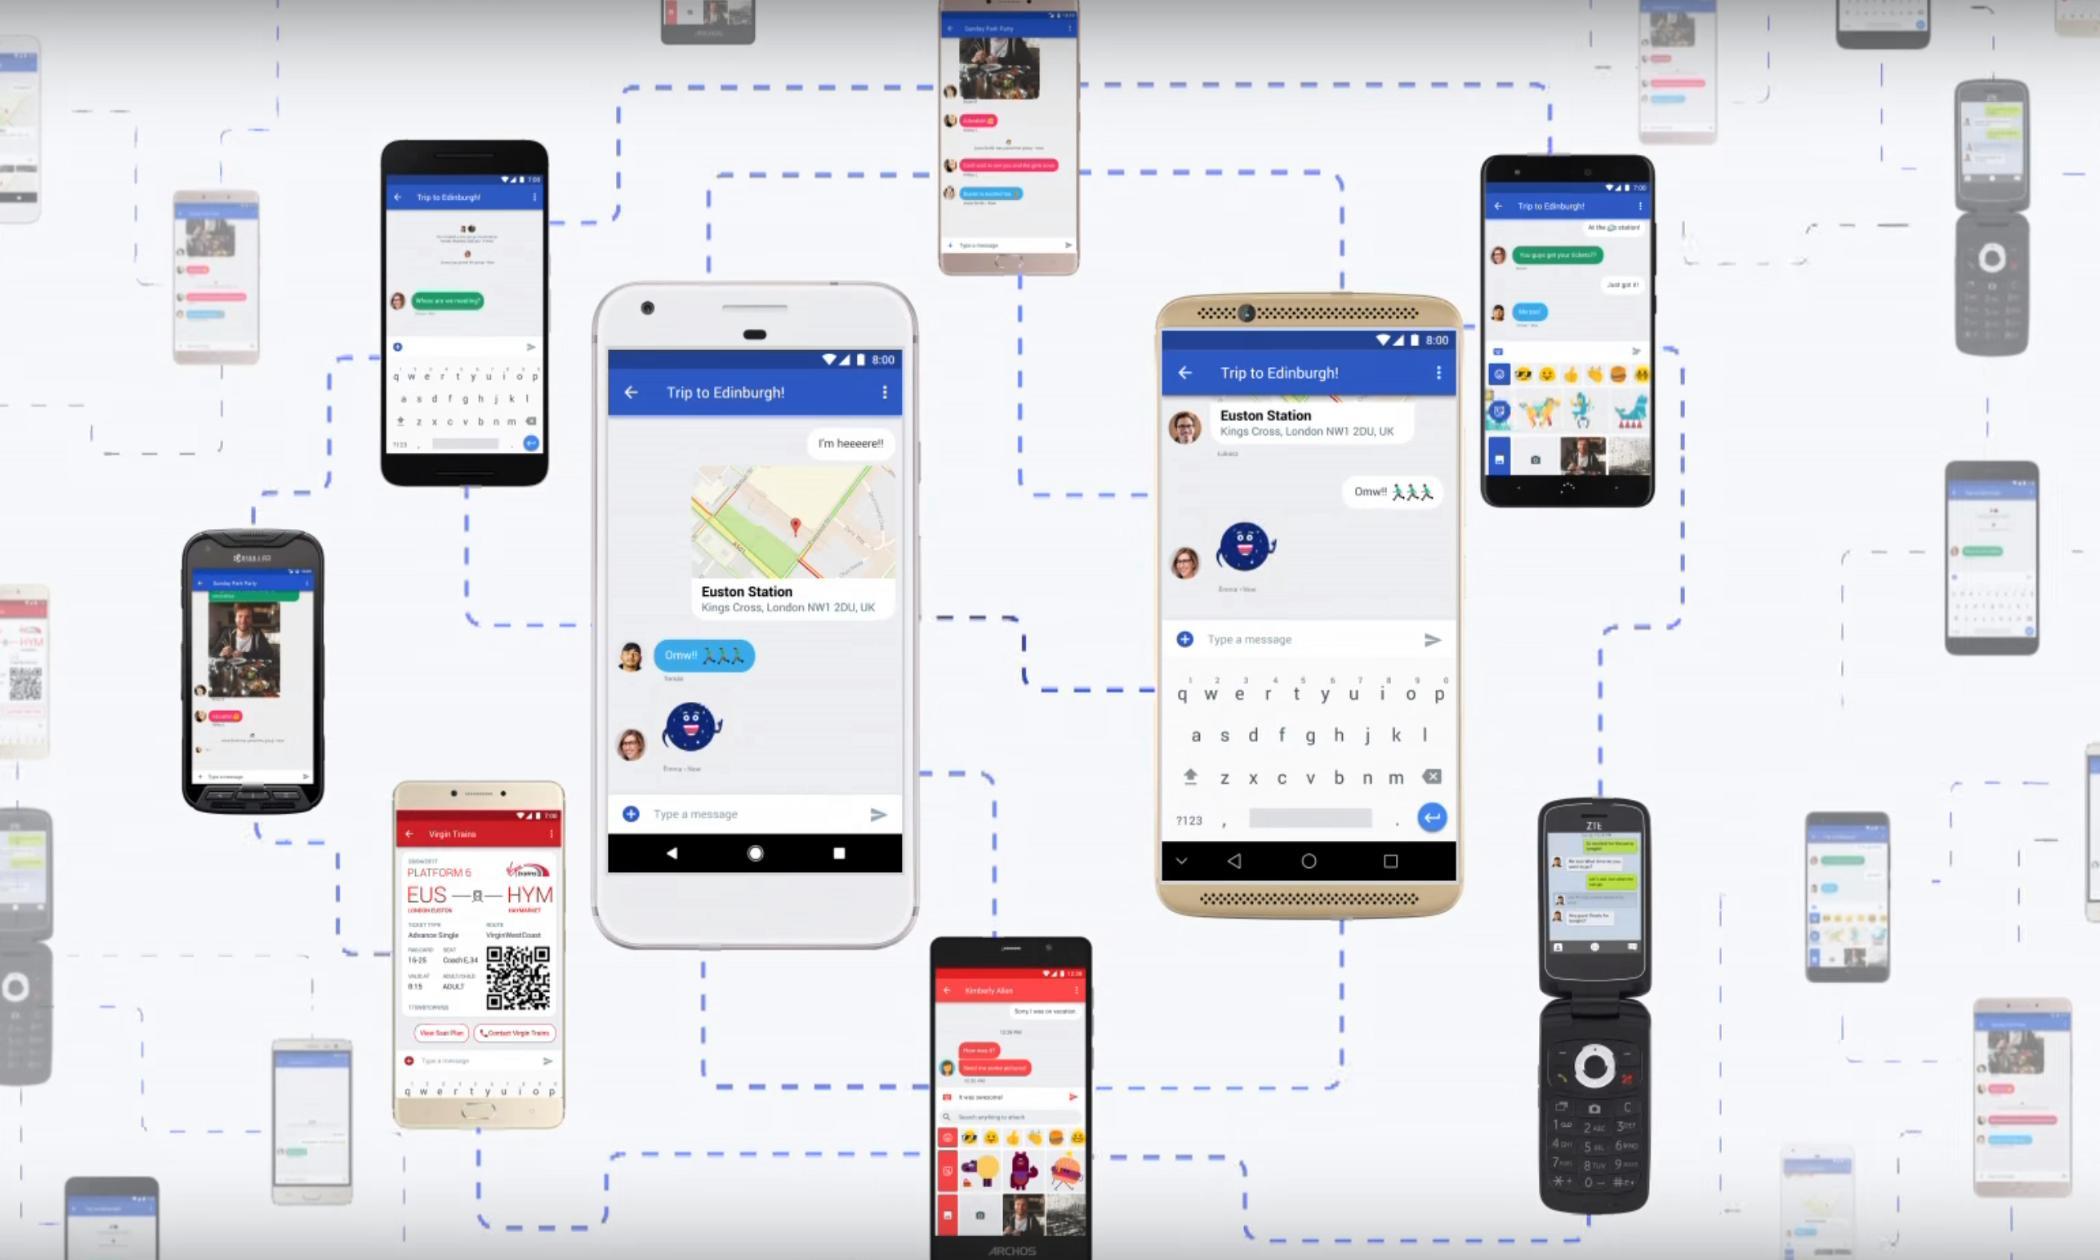 Chat: Google's big shot at killing Apple's iMessage